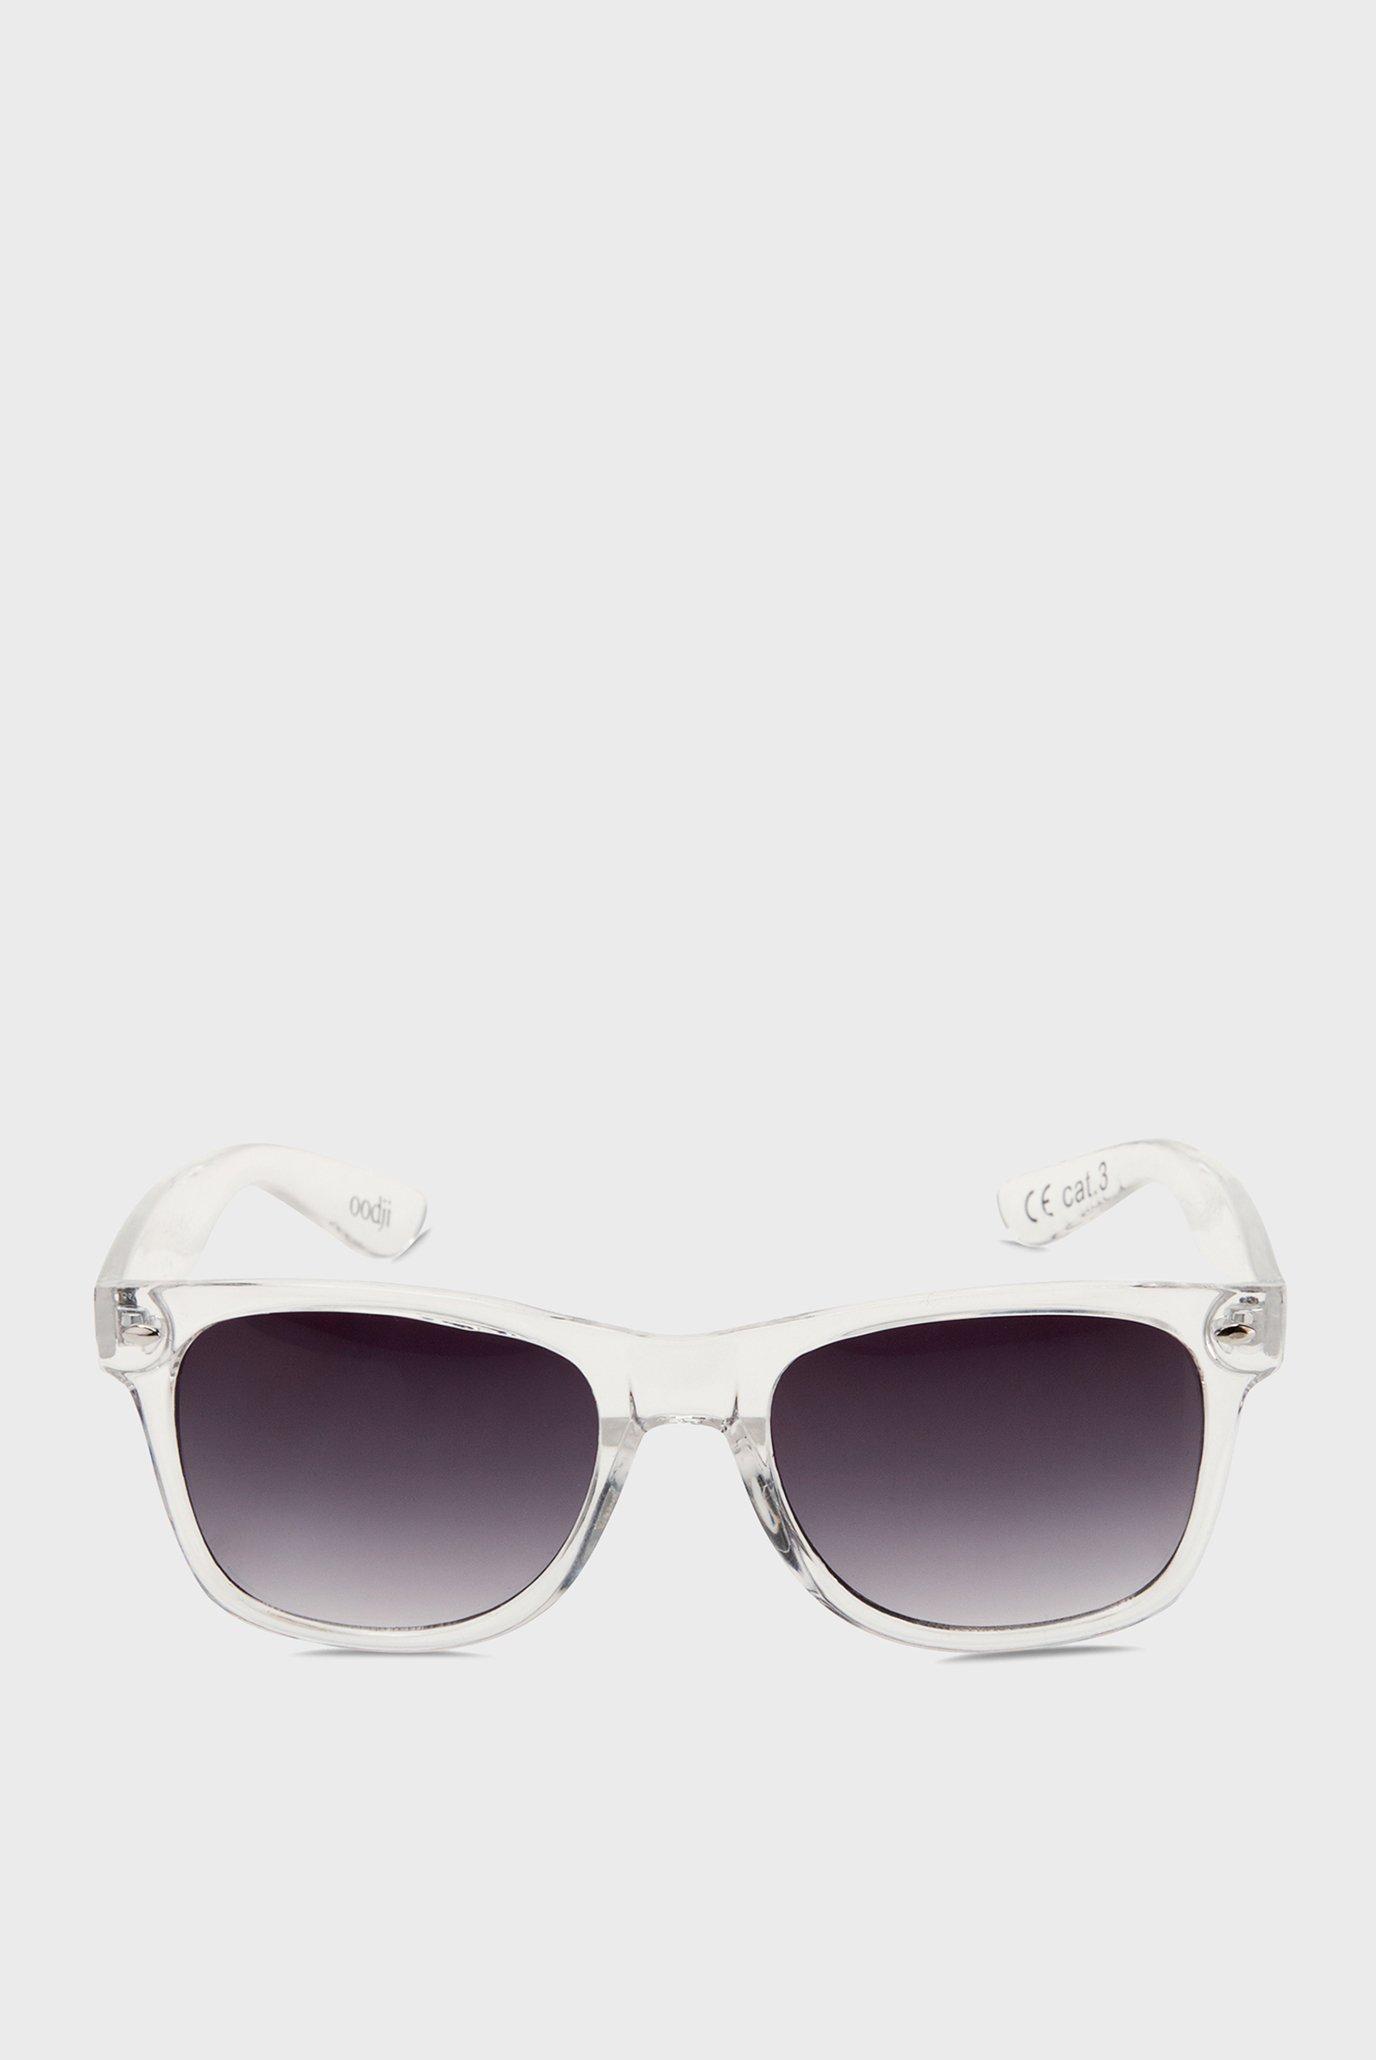 7d3bc9ac3bbd Купить Мужские прозрачные солнцезащитные очки Oodji Oodji 8L080095M ...